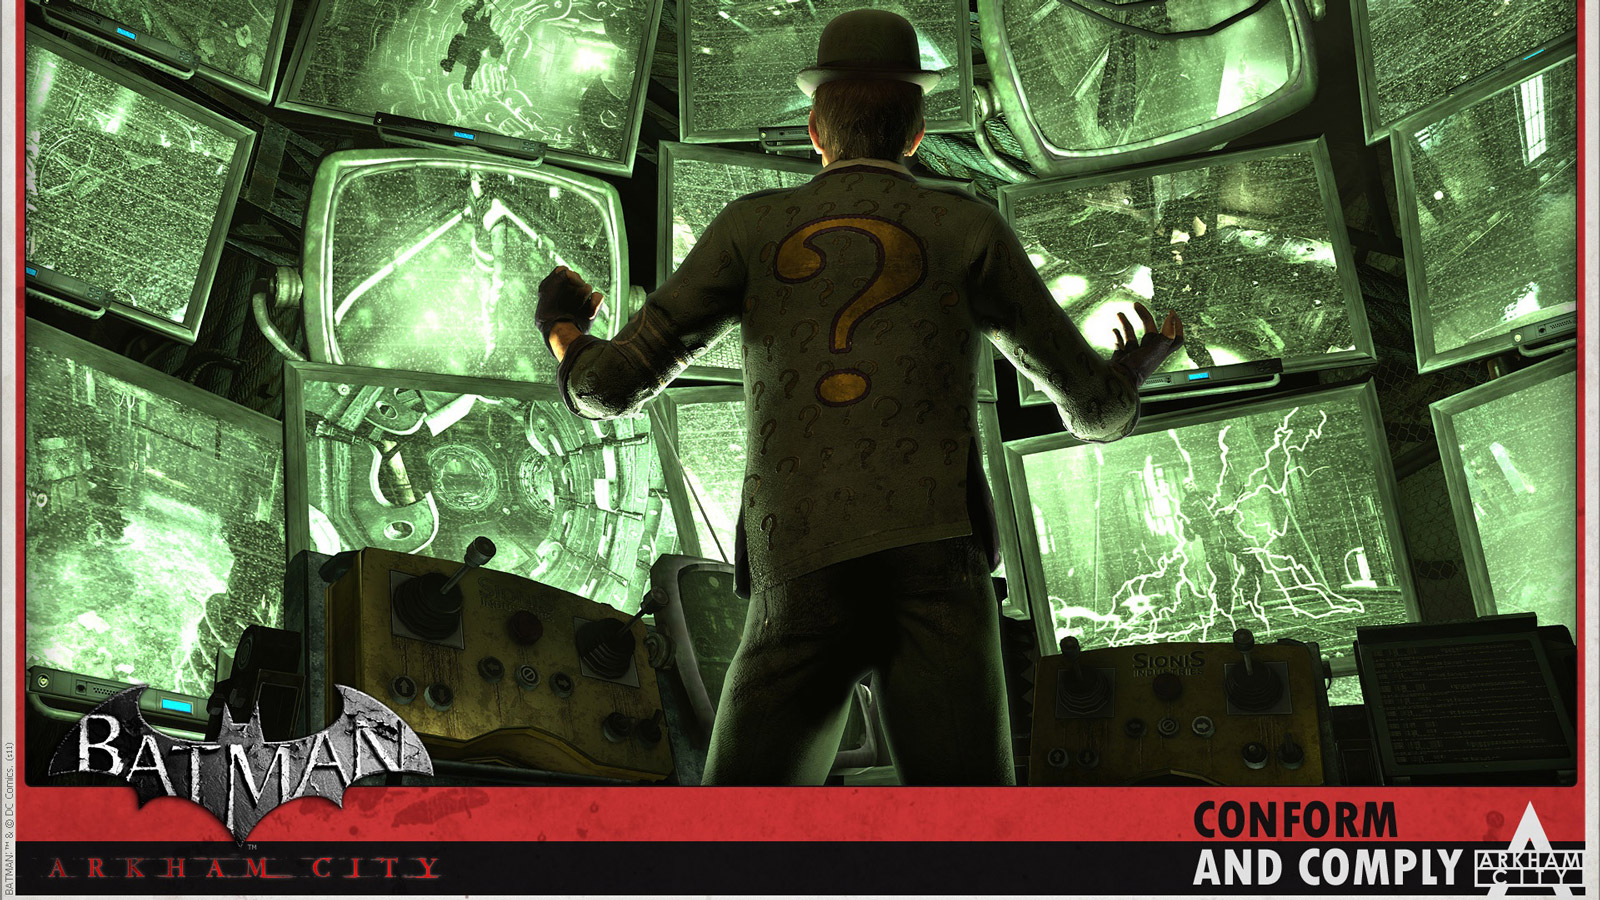 Free Batman: Arkham City Wallpaper in 1600x900